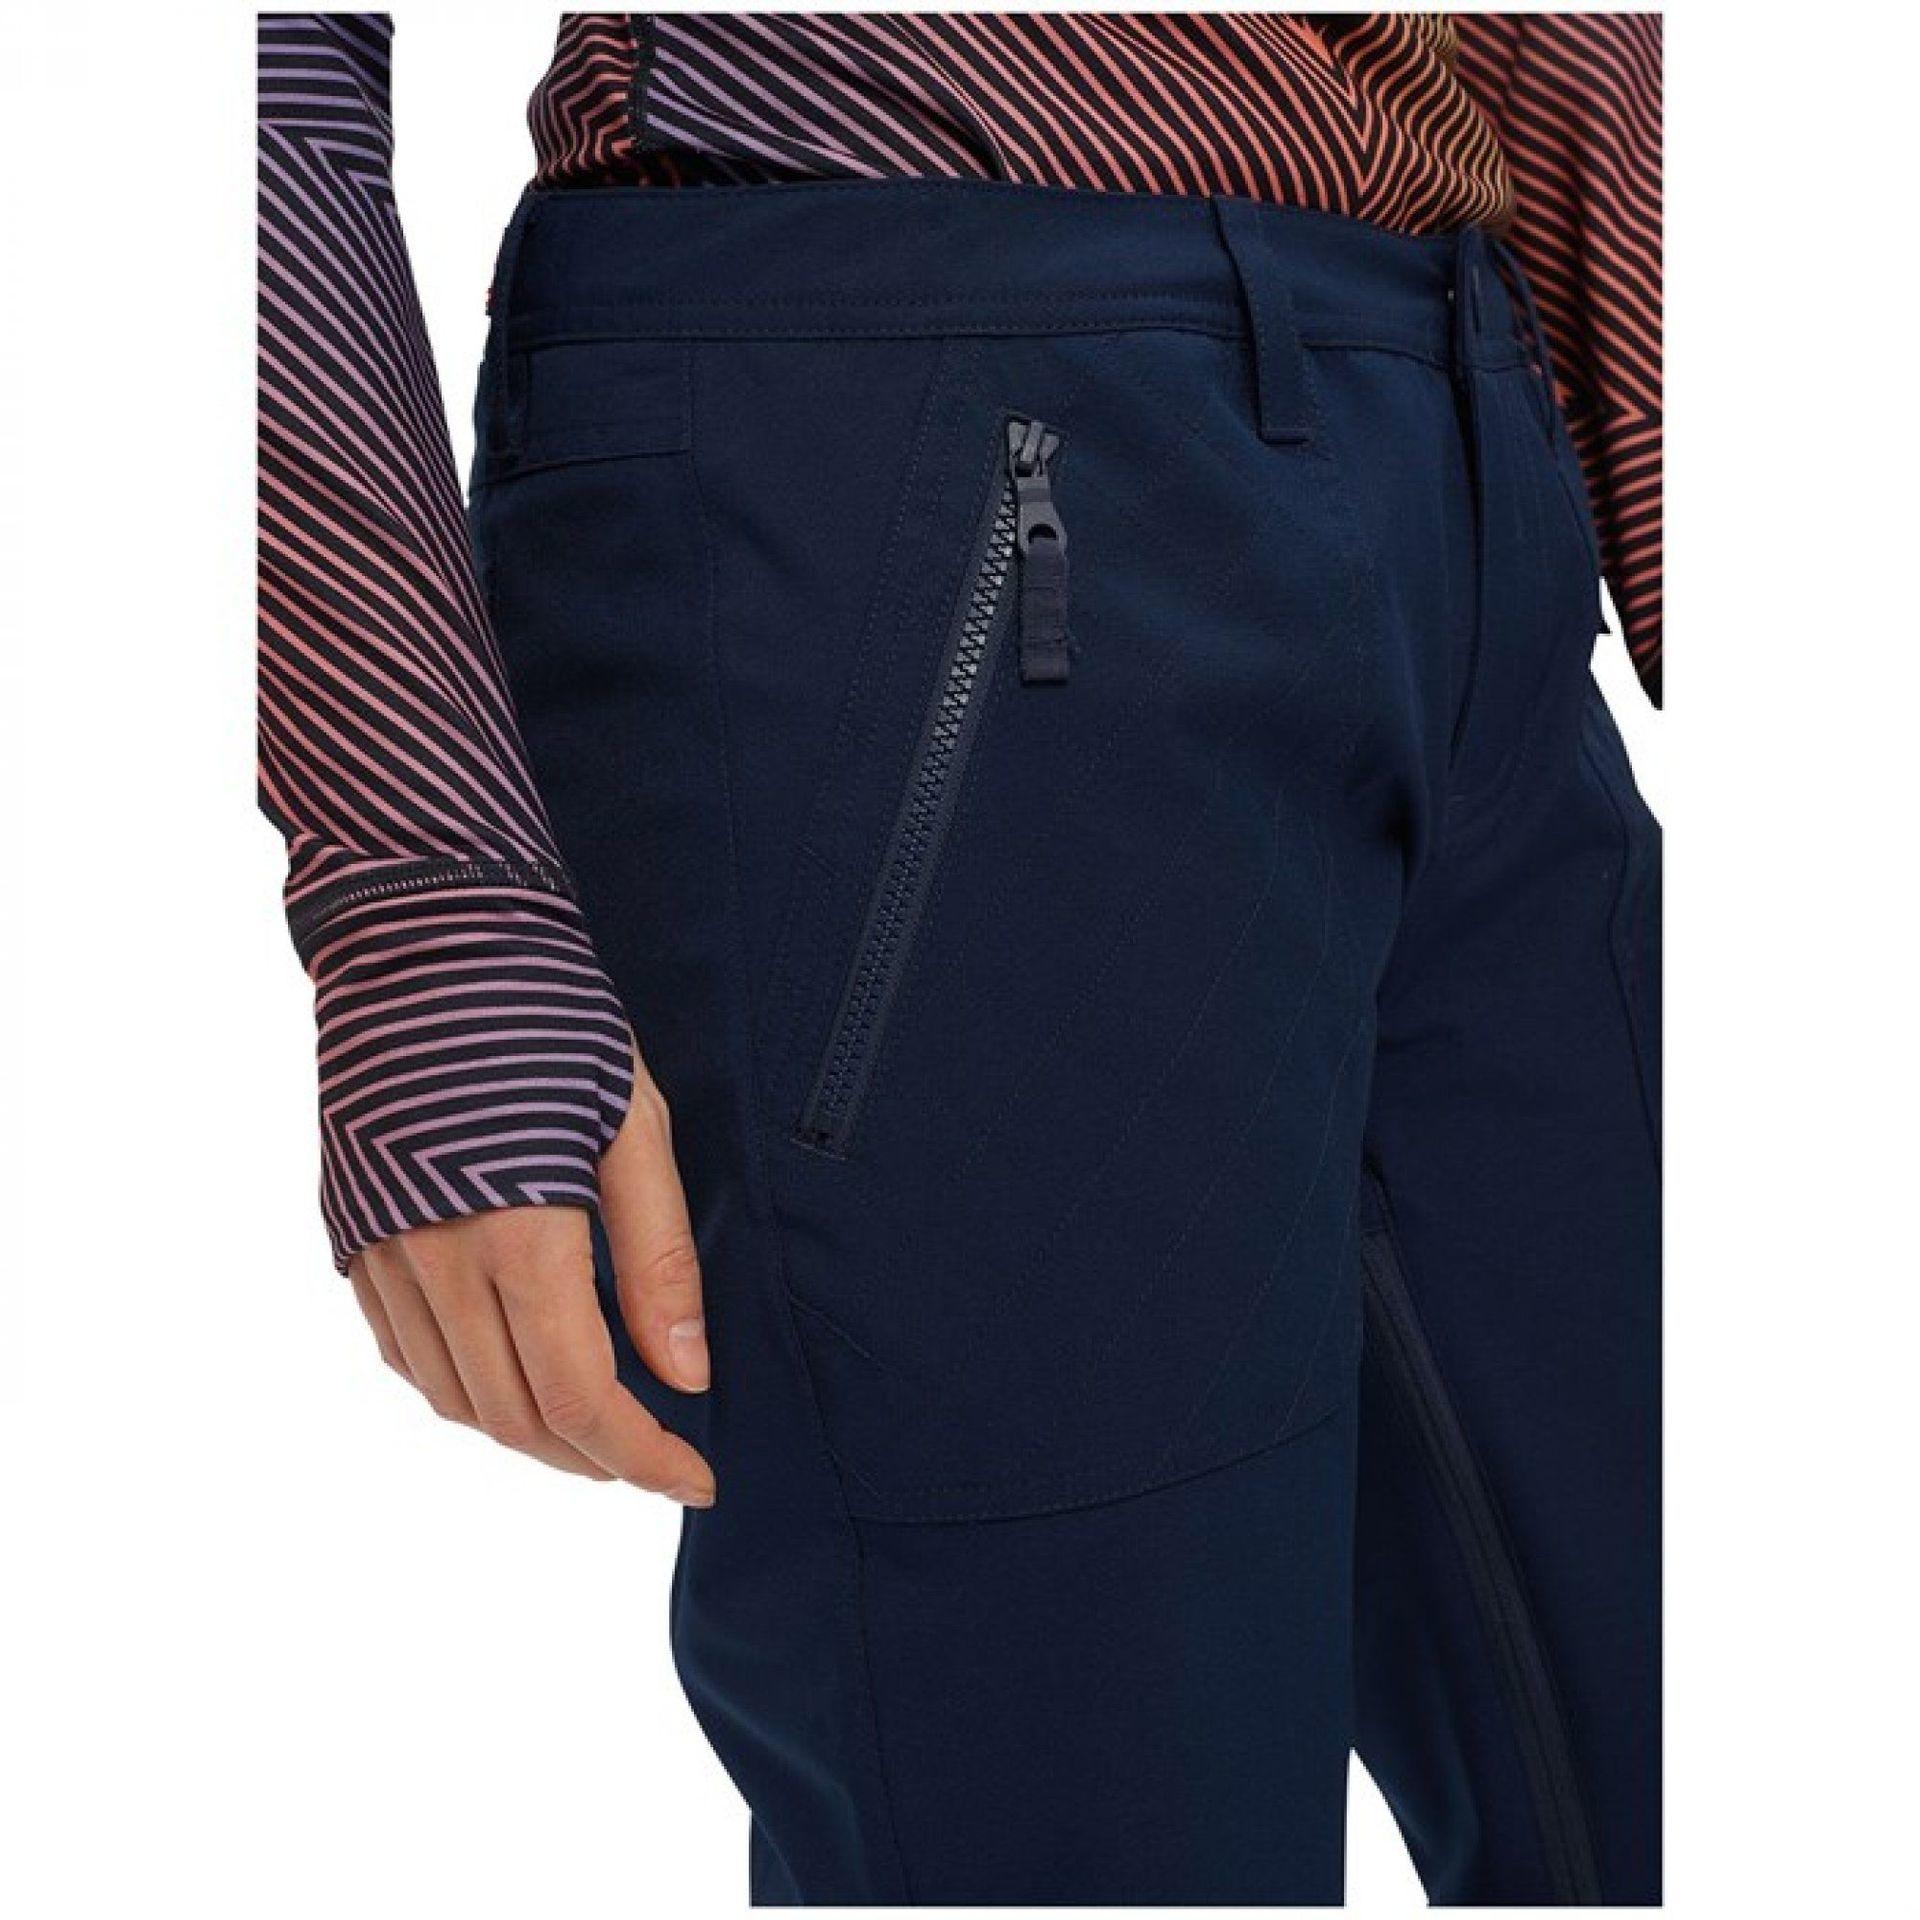 SPODNIE BURTON VIDA DRESS BLUE 150061 400 4